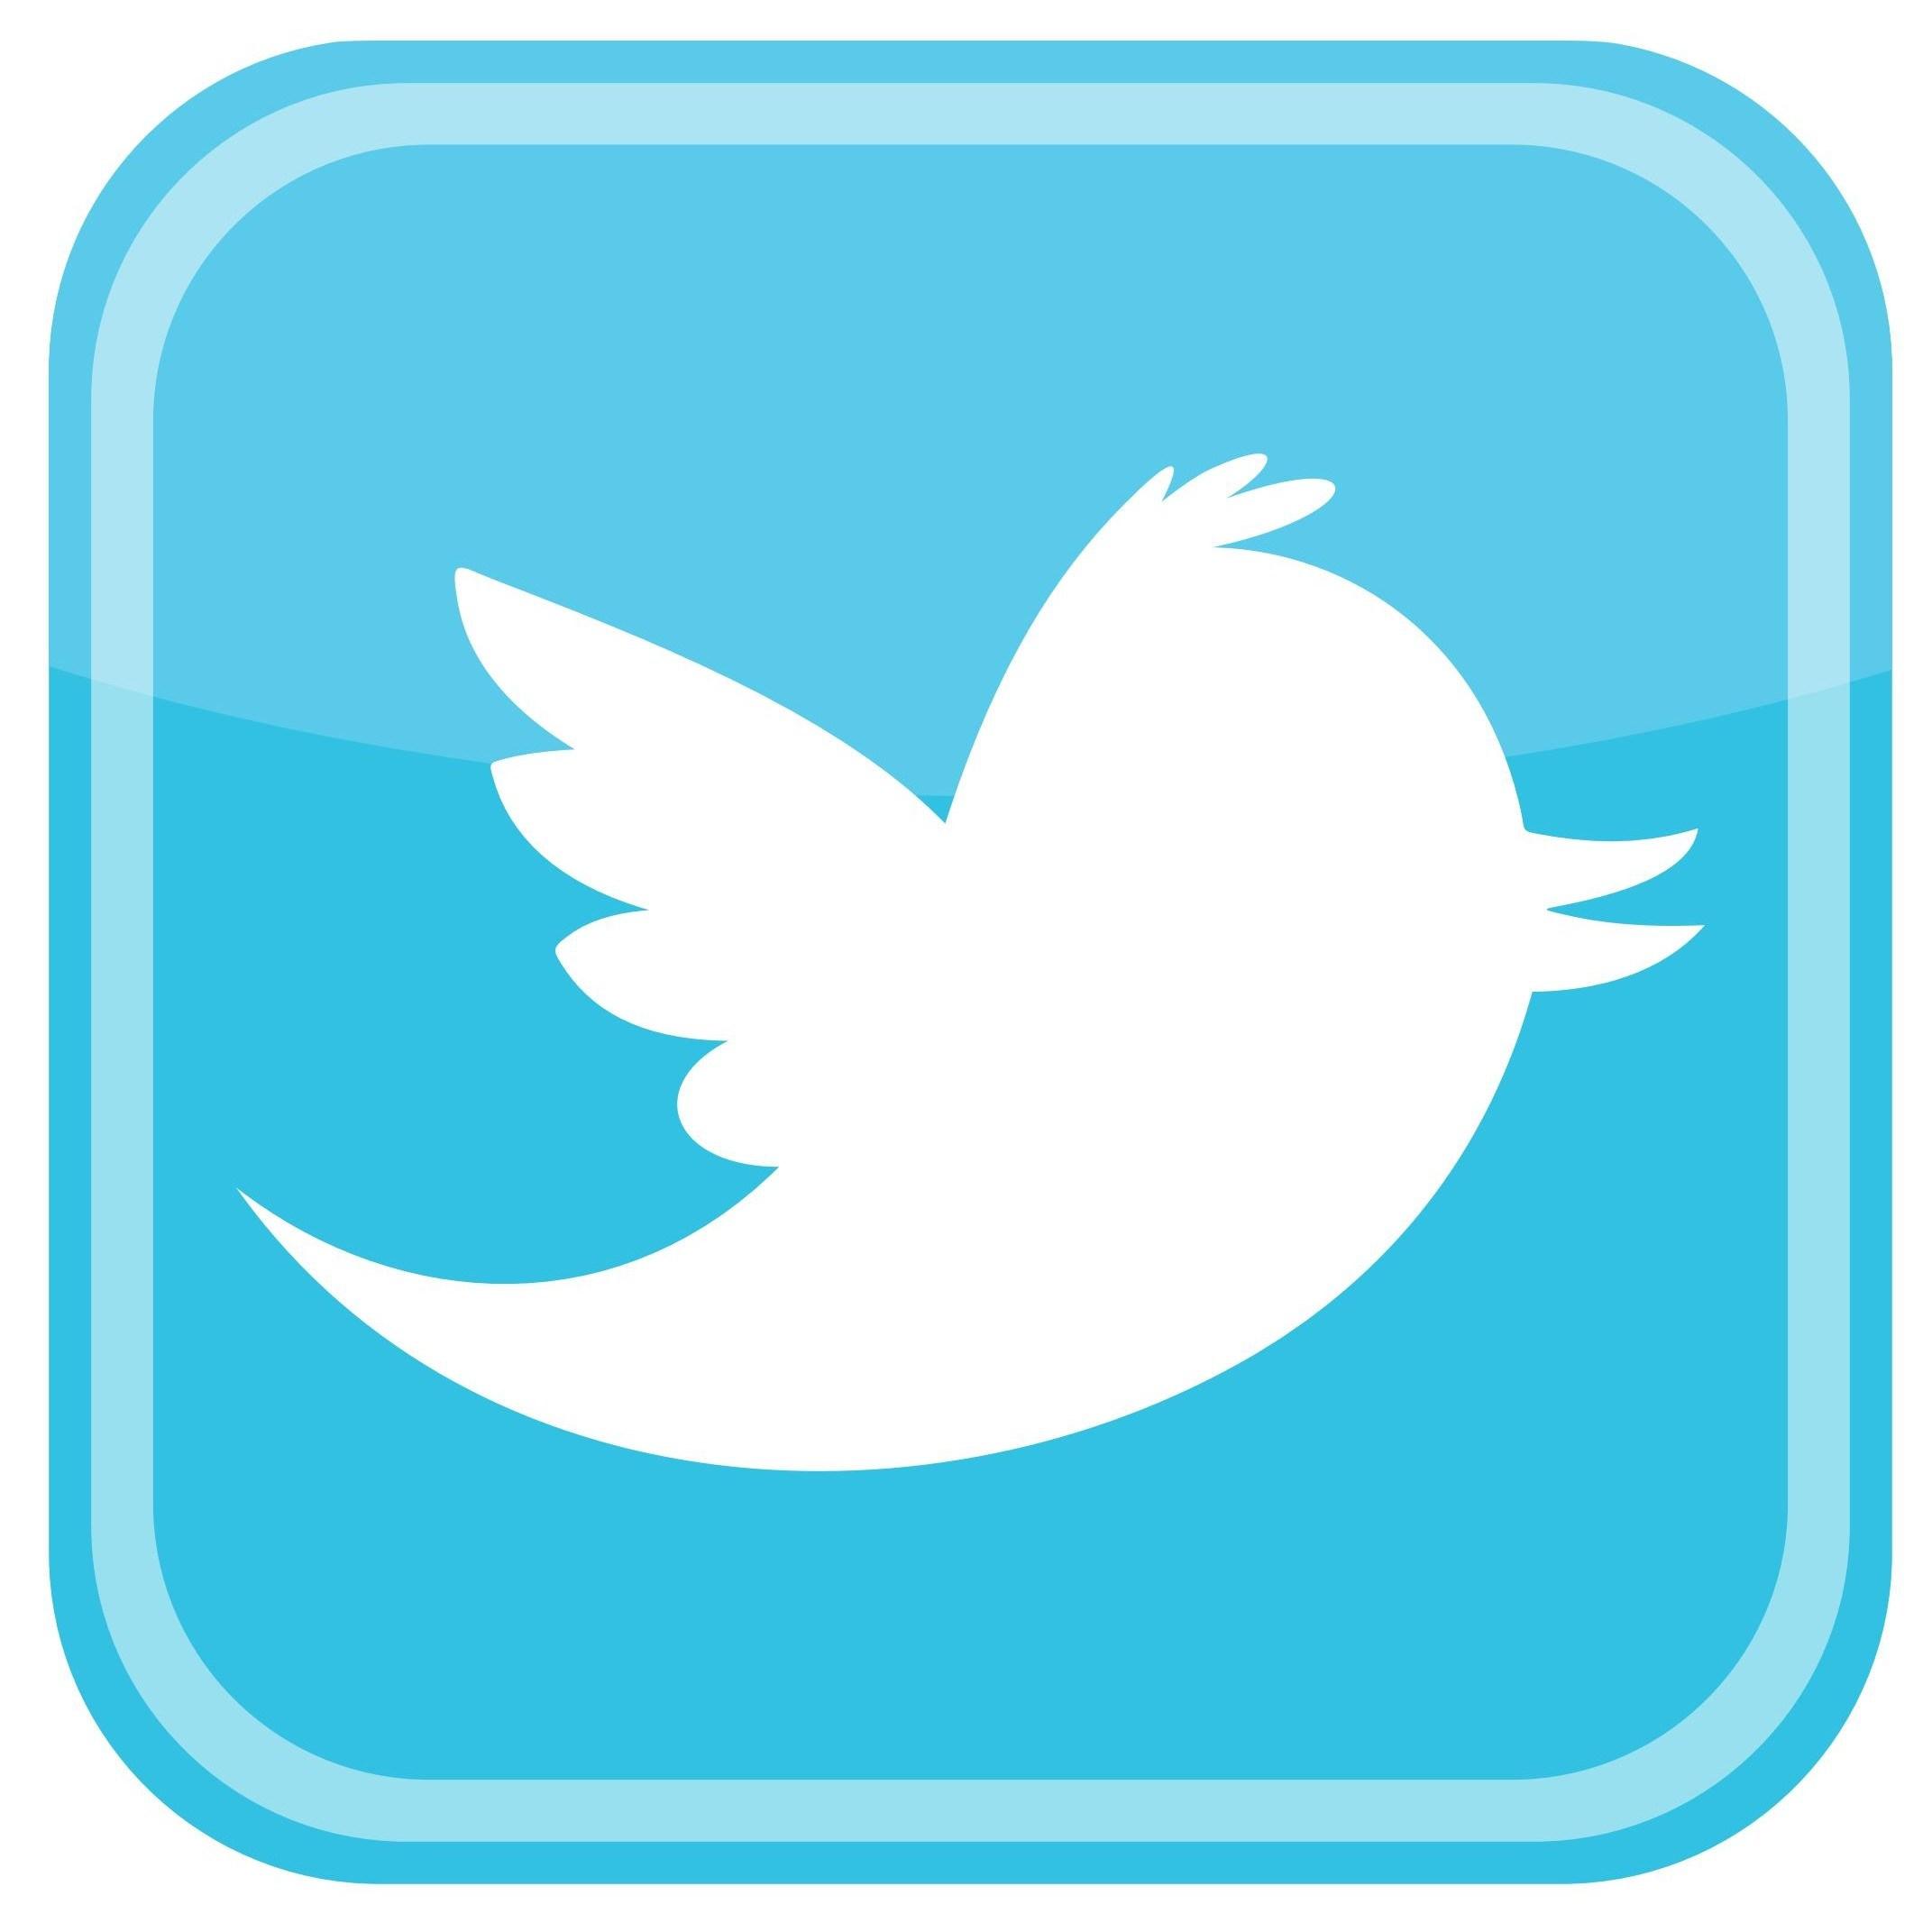 Twitter Bird Icon Logo png